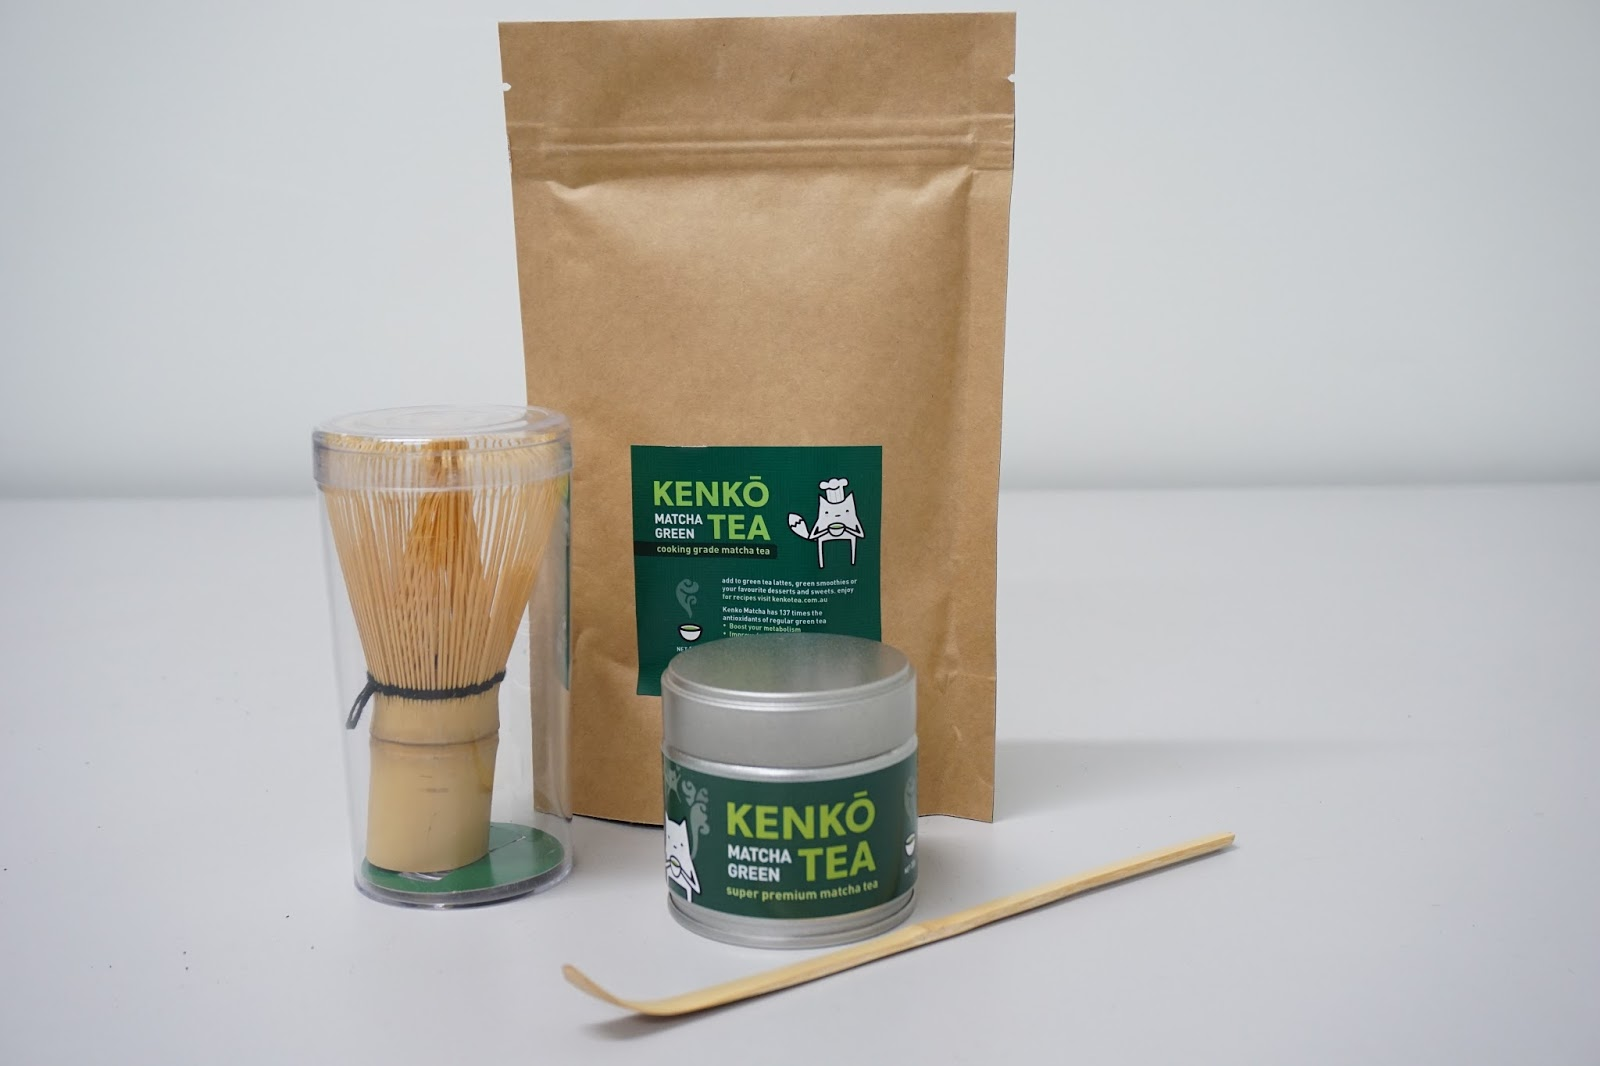 Kenko Tea set